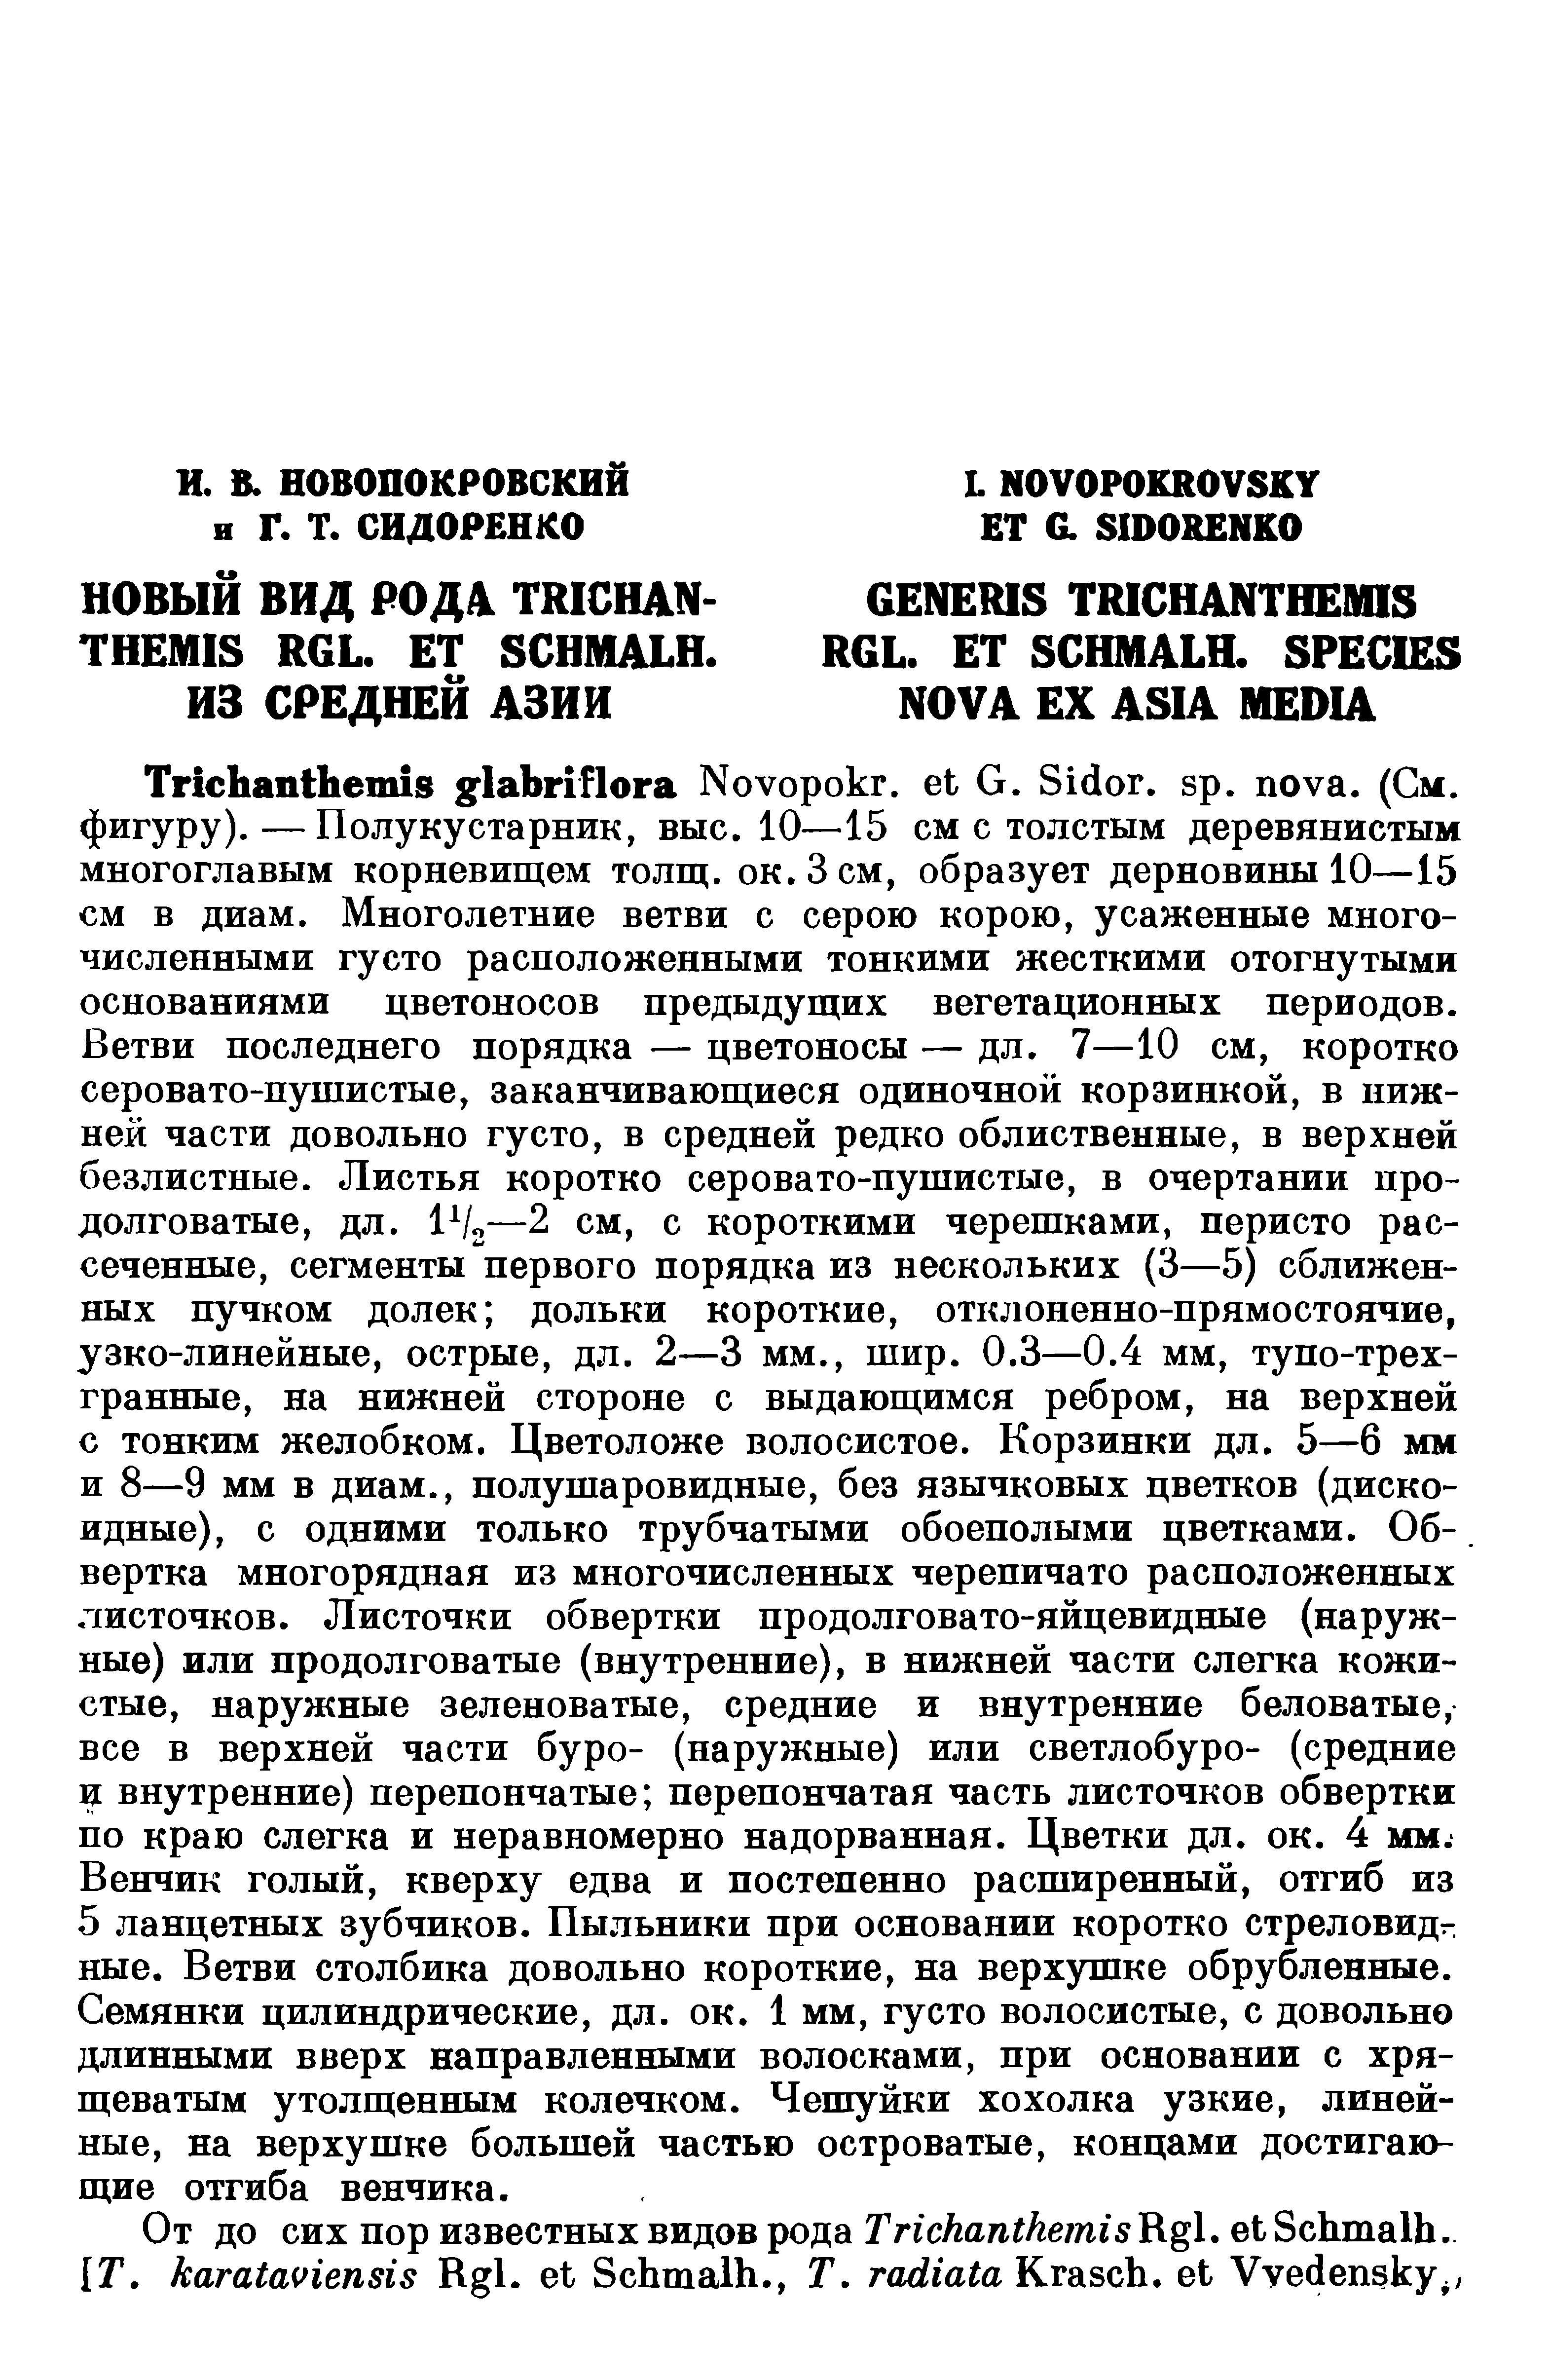 https://forum.plantarium.ru/misc.php?action=pun_attachment&item=30279&download=0